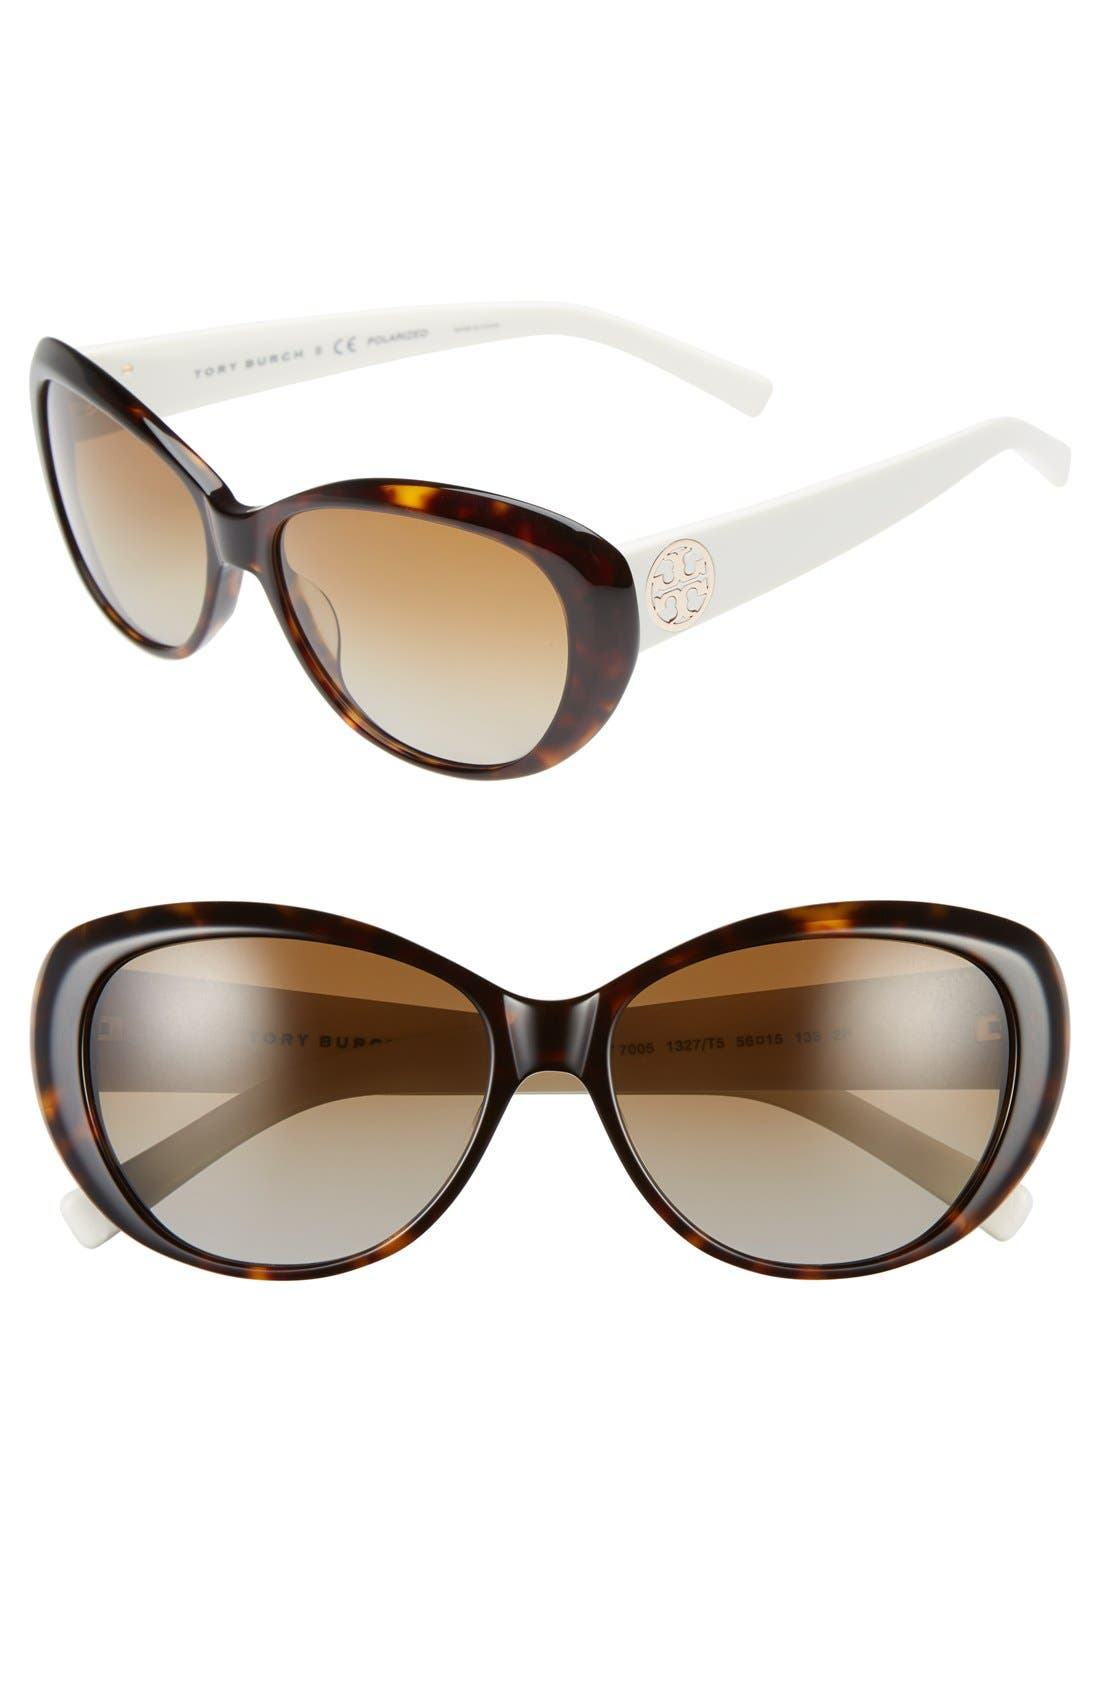 56mm Polarized Cat Eye Sunglasses,                         Main,                         color, Dark Tortoise/ Polar